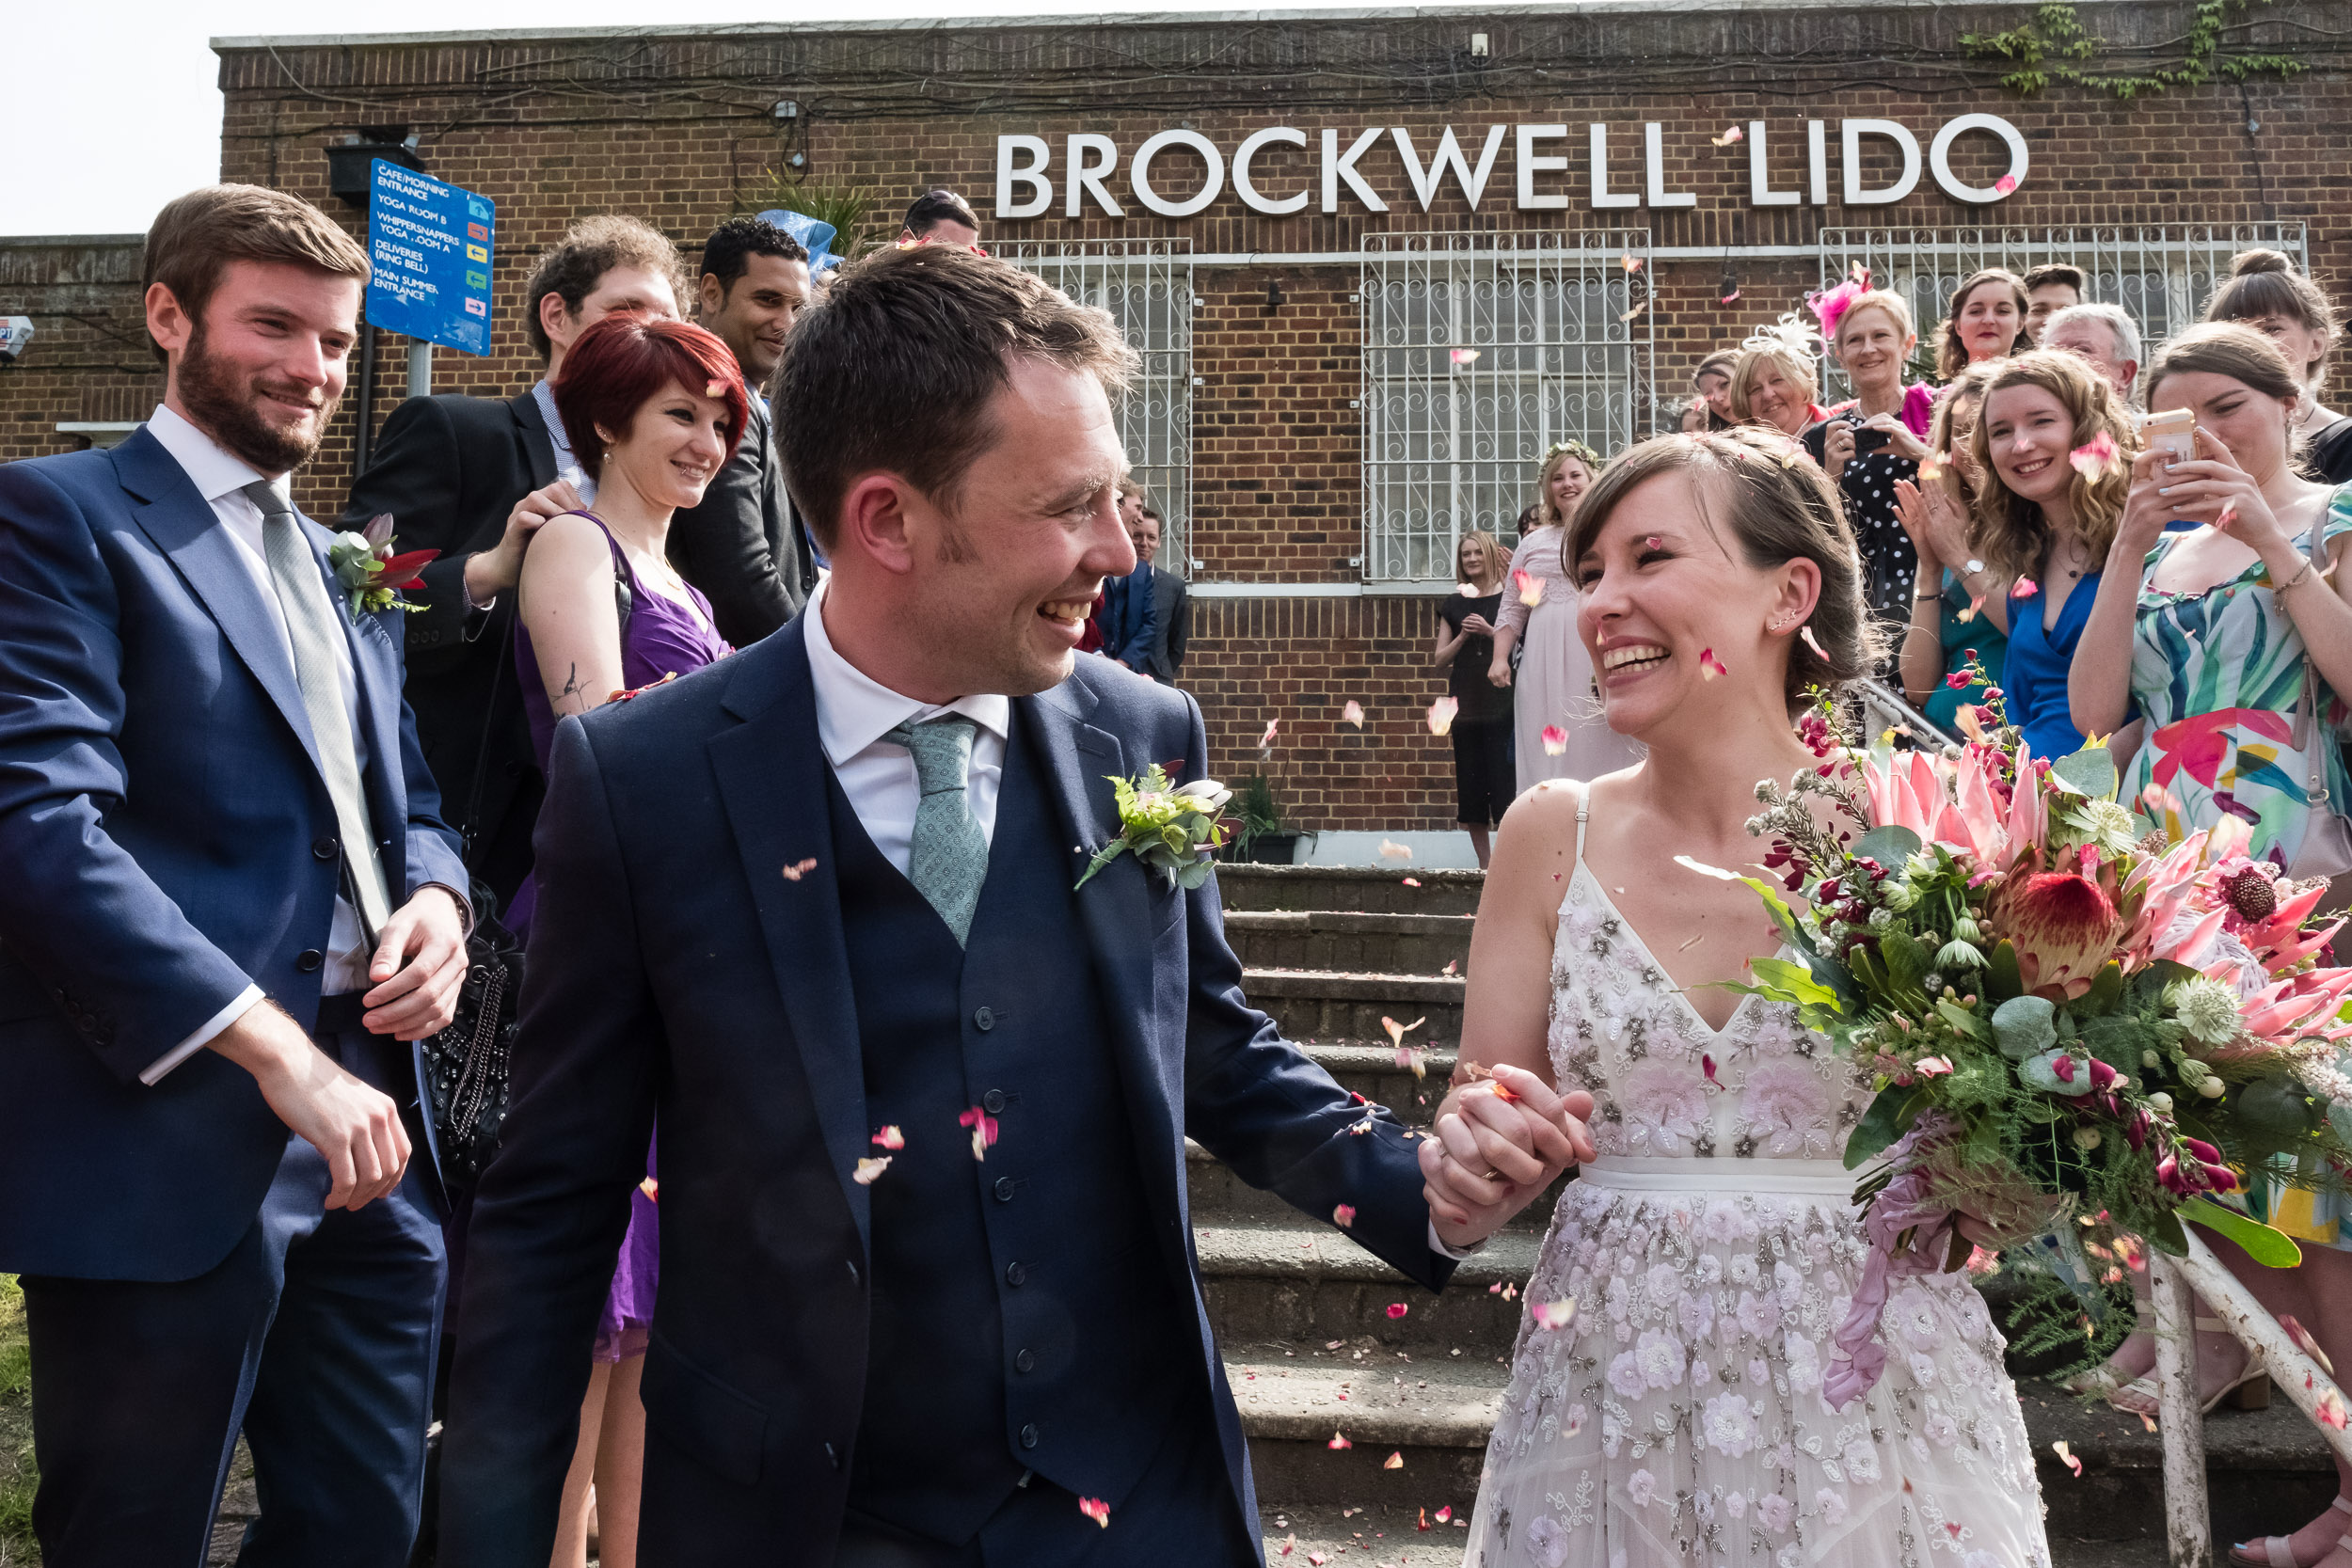 brockwell-lido-brixton-herne-hill-wedding-216.jpg